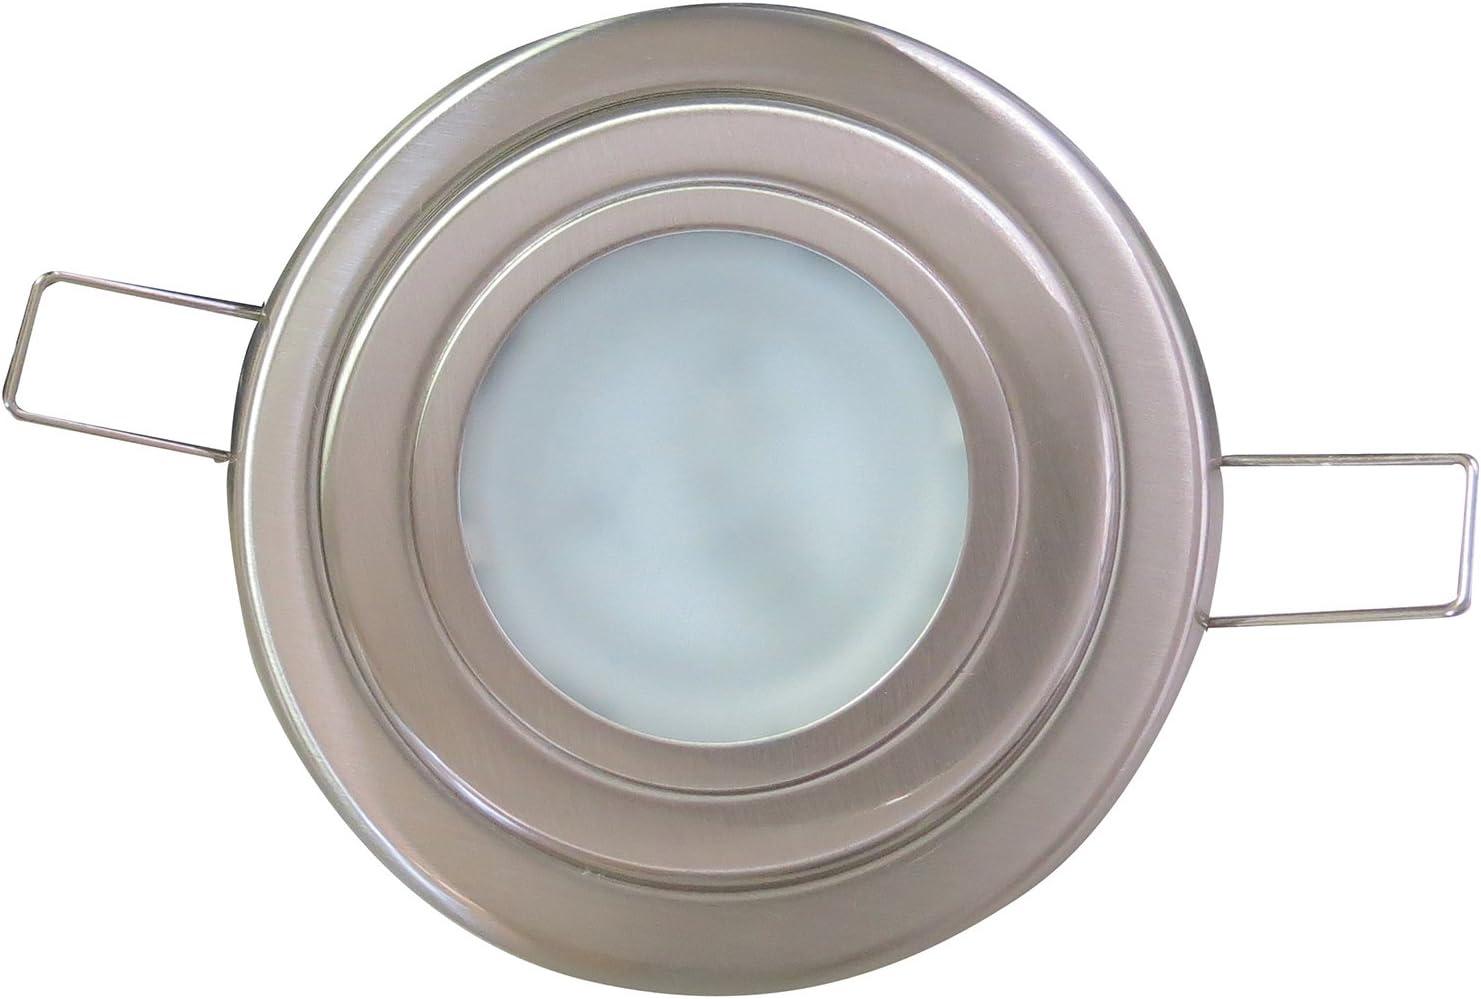 69929B-NI6K//F-DB ITC Decor Nickel LED Overhead Light